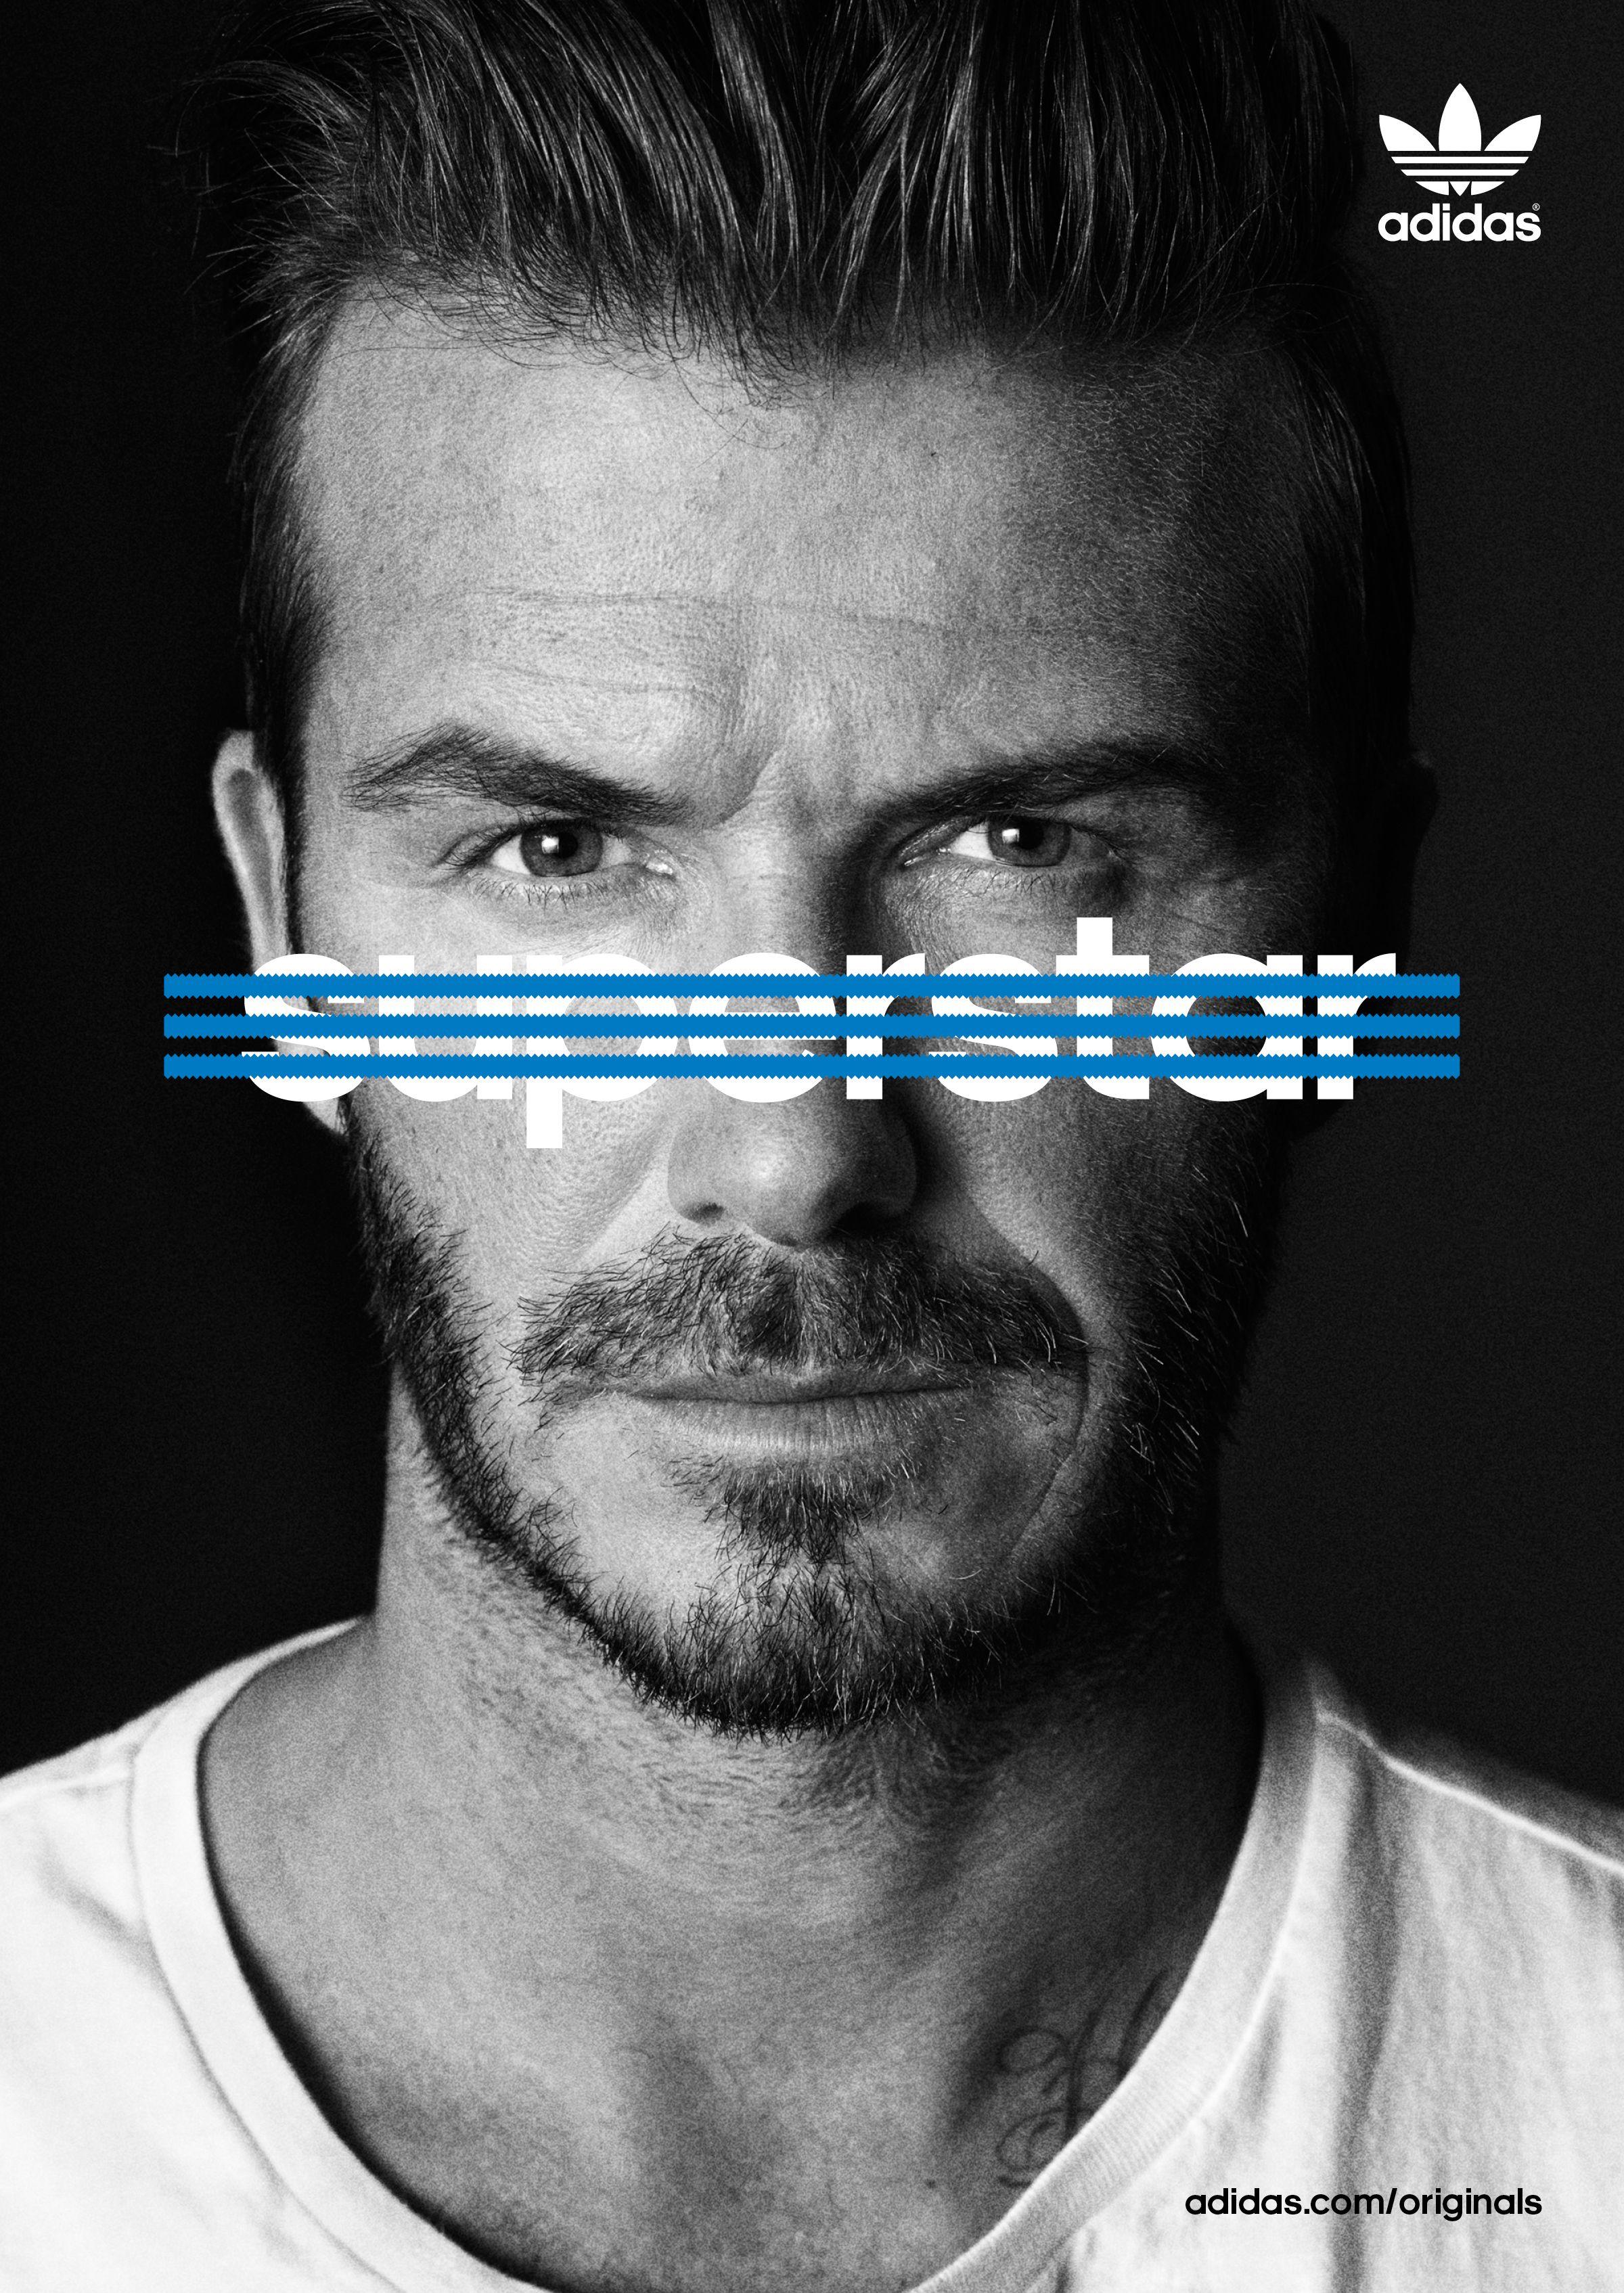 Johannes Leonardo Adidas ad, Adidas poster, Adidas